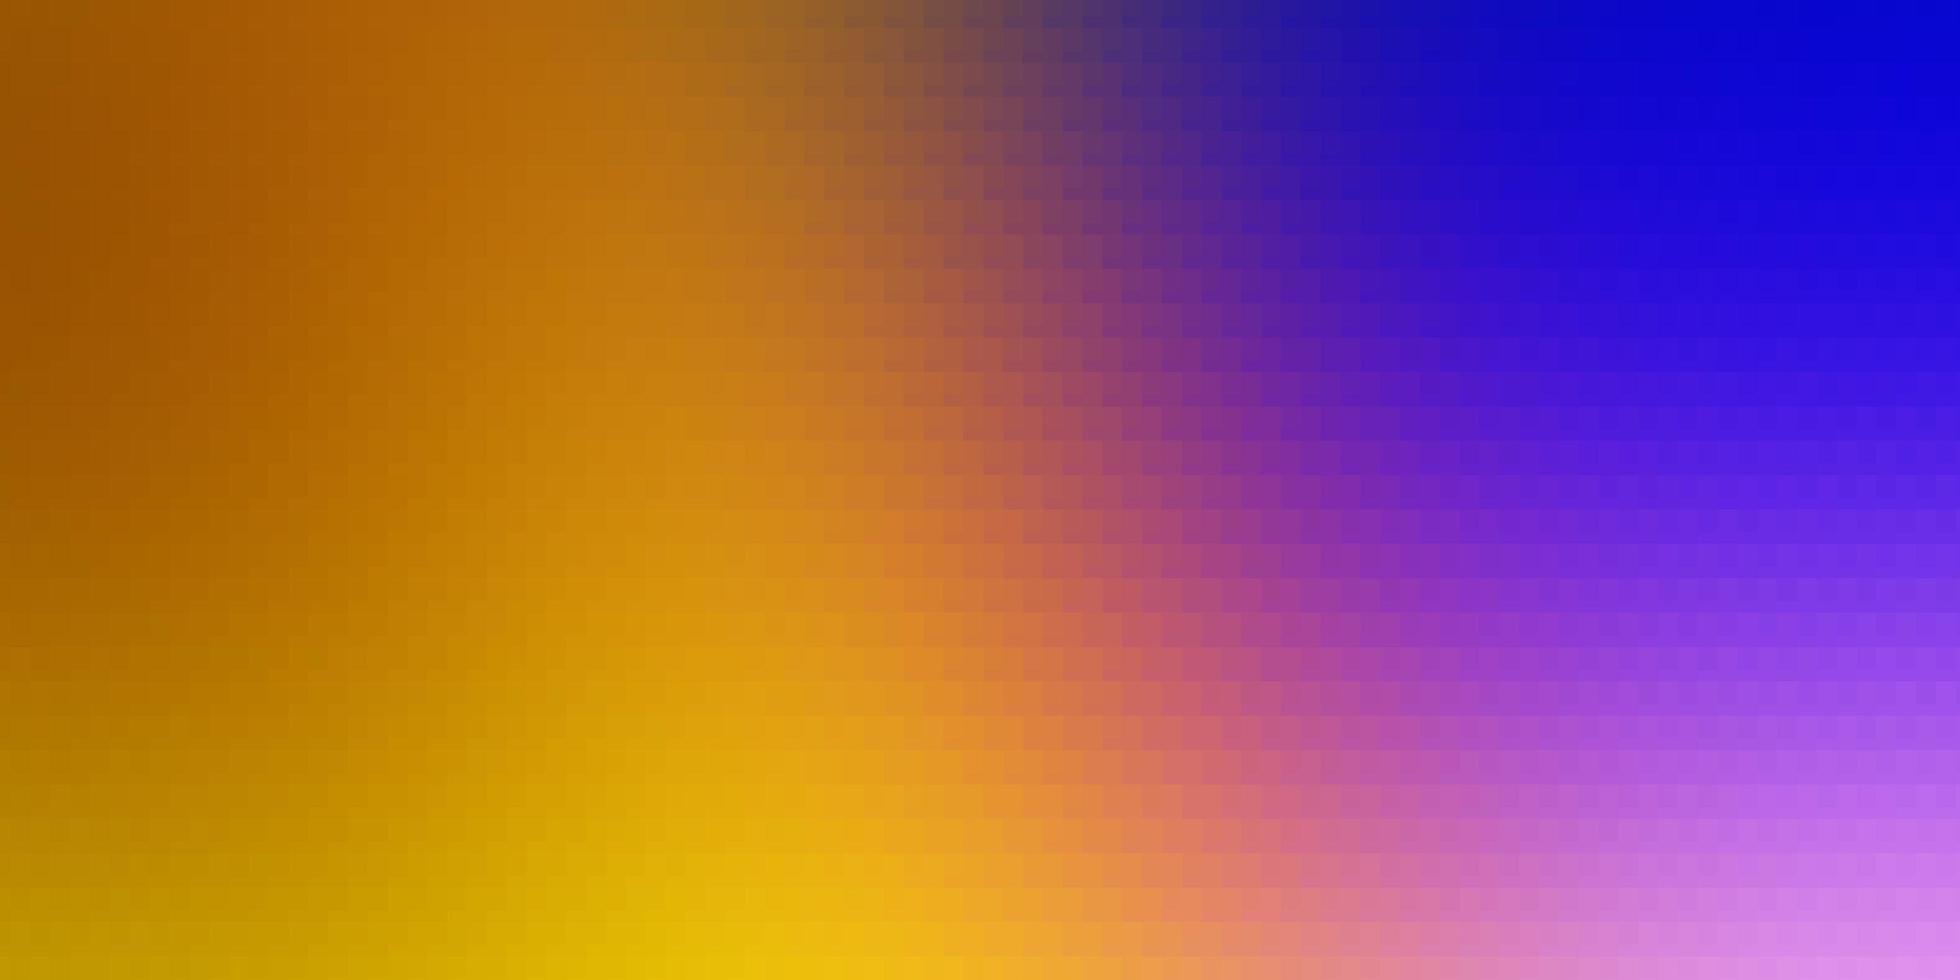 ljusrosa, gula vektormall i rektanglar. vektor